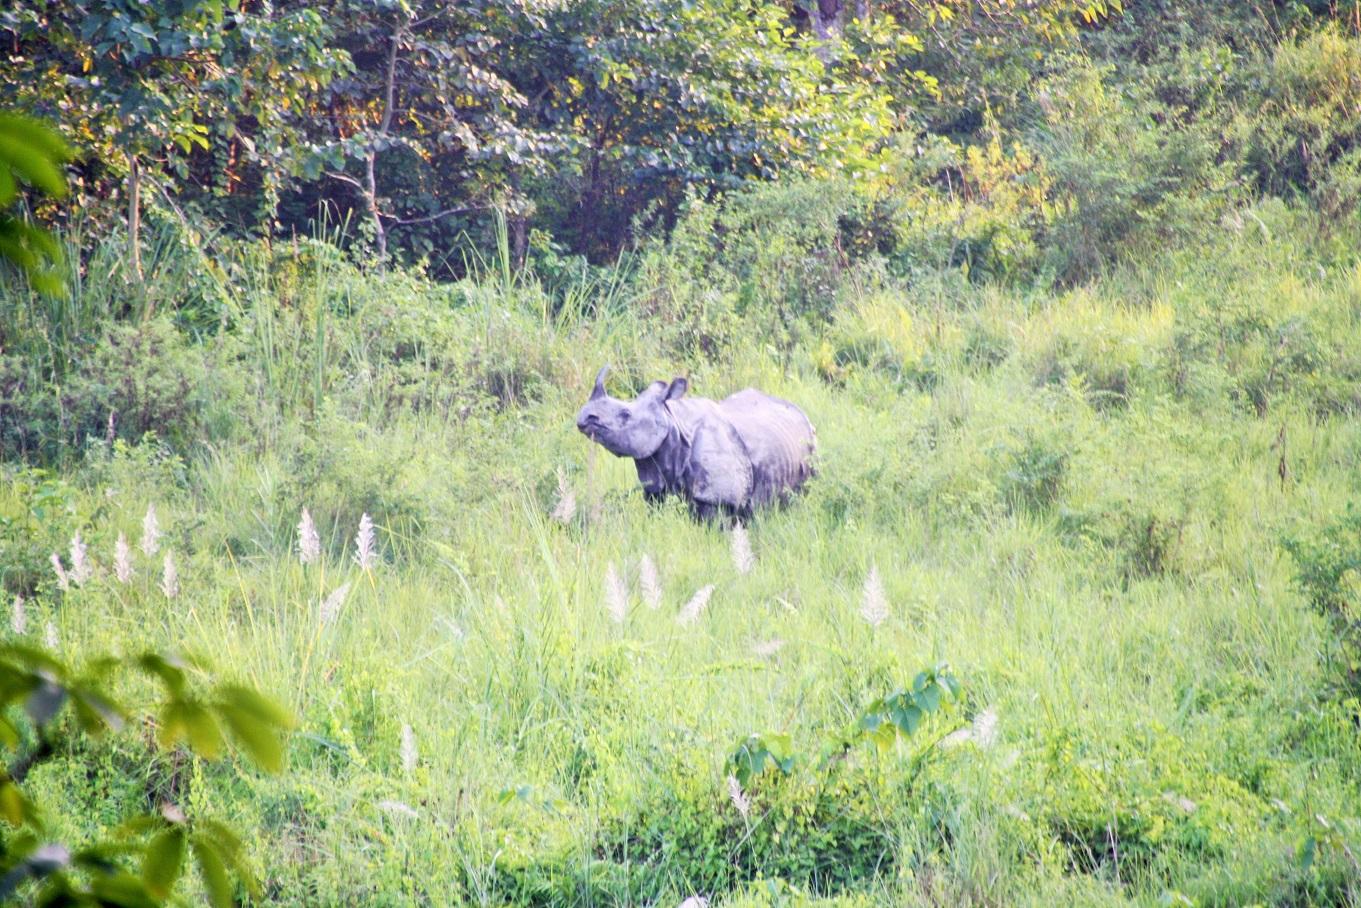 Neushoorn in Chitwan